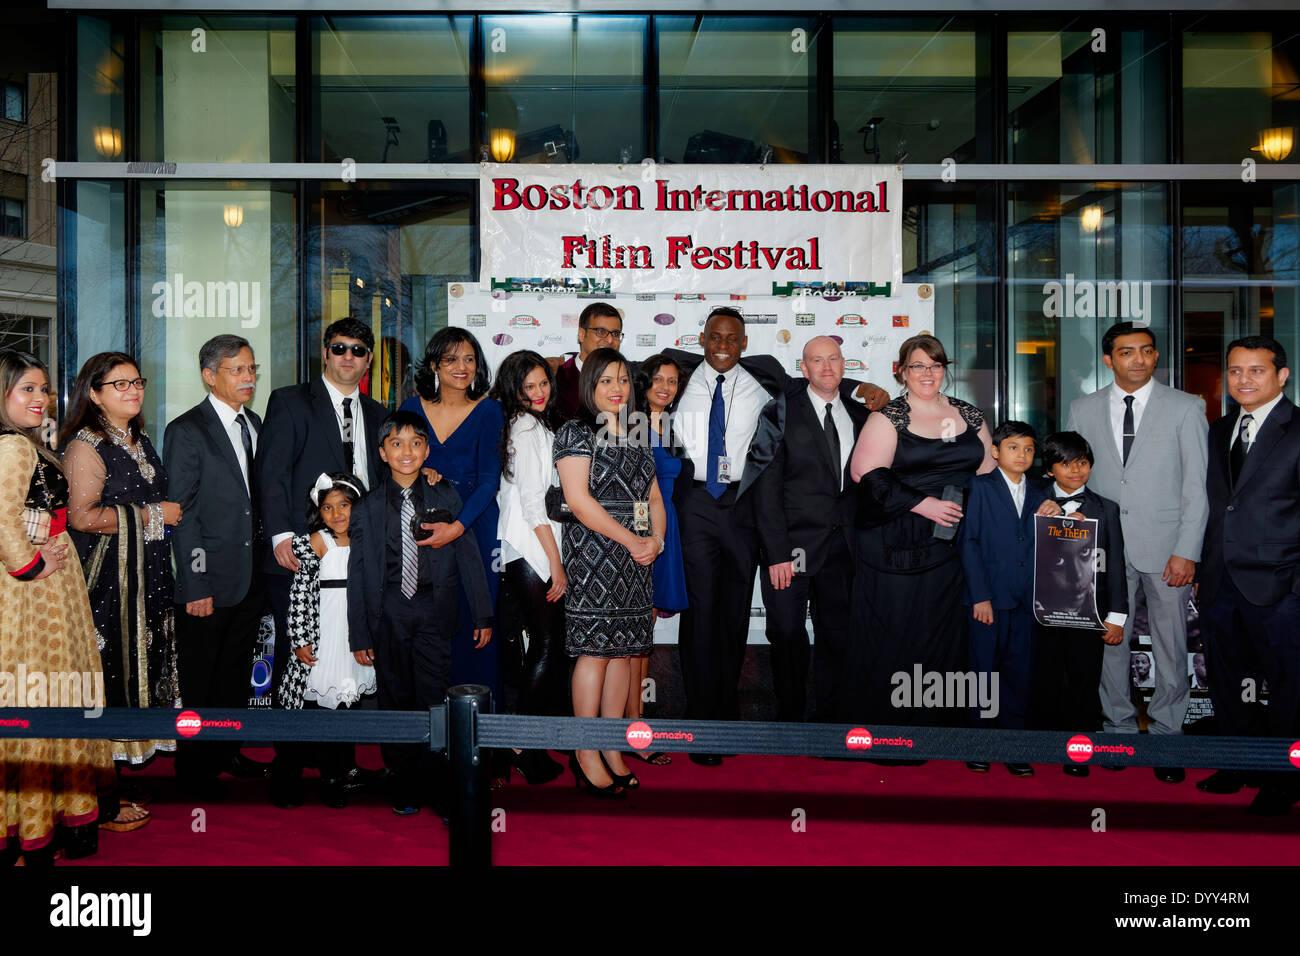 Boston International Film Festival - Boston, Massachussetts USA - The crew from The Theft pose at the 2014 Boston International - Stock Image